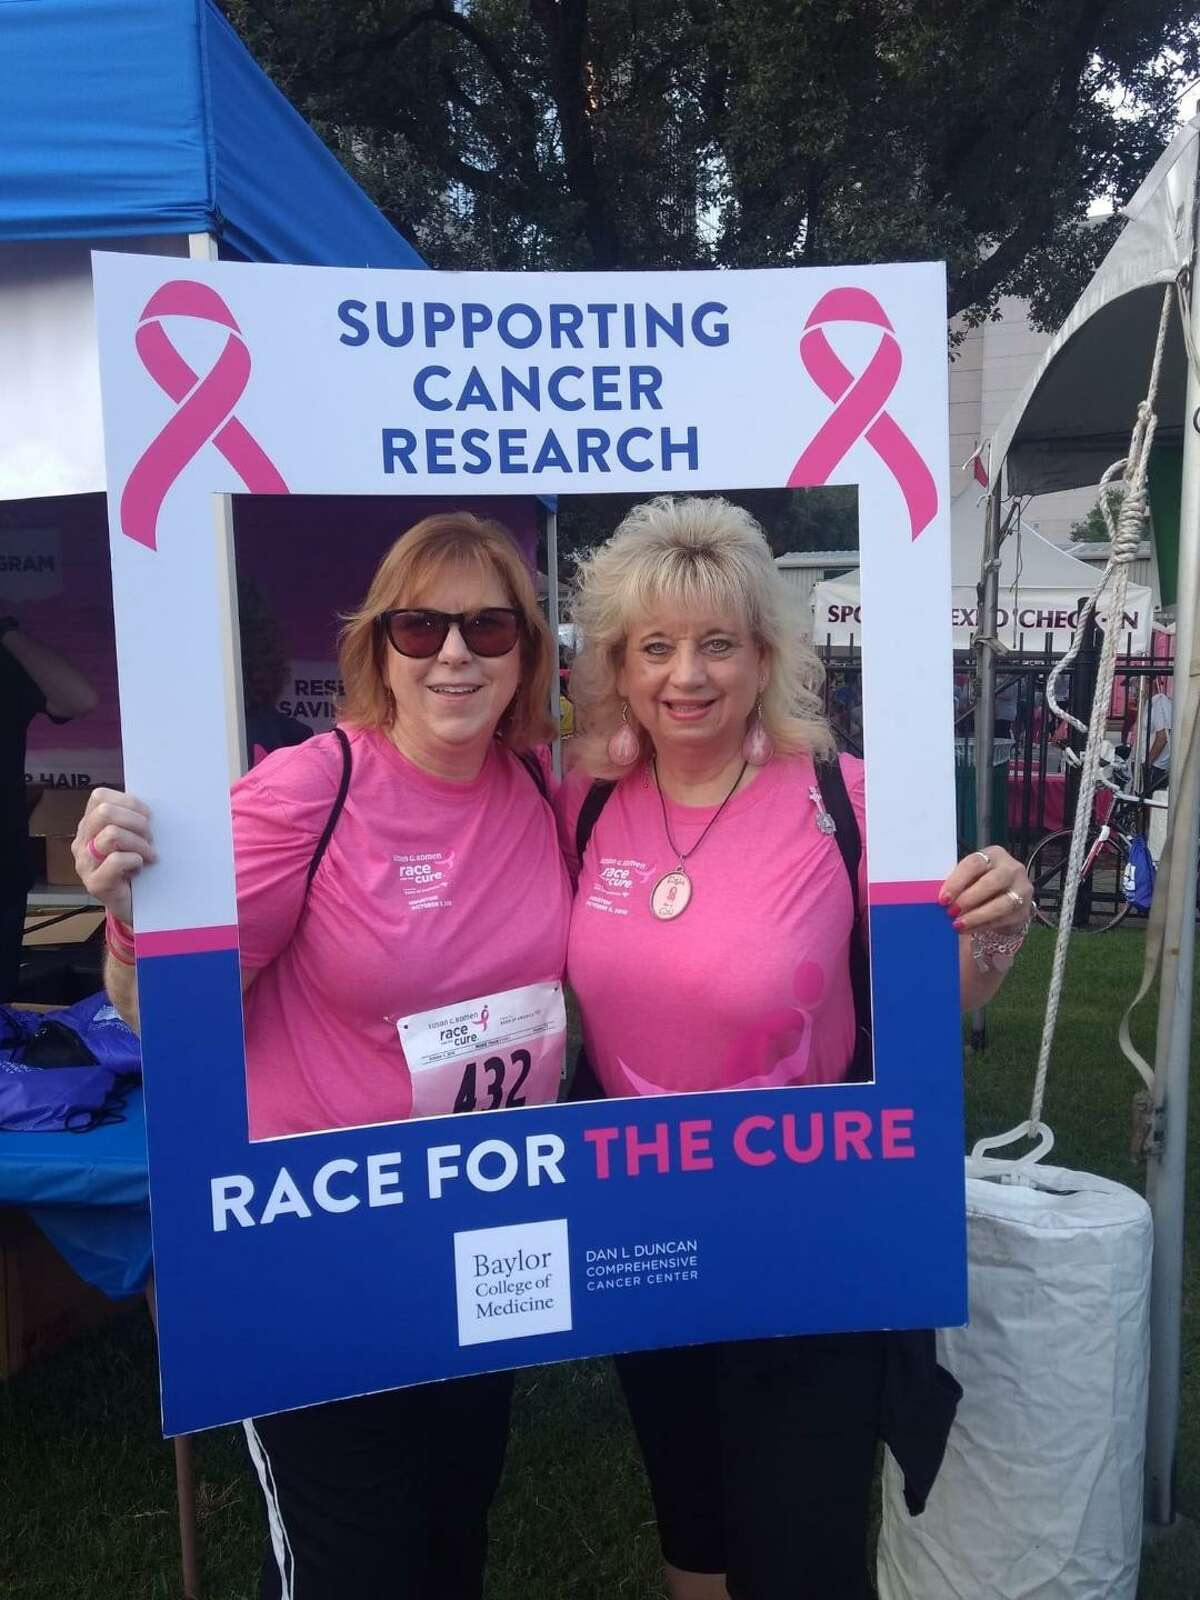 Rhonda Kirchman, right, and friend Darlene Kilburn participate in a Komen Houston Race for the Cure.